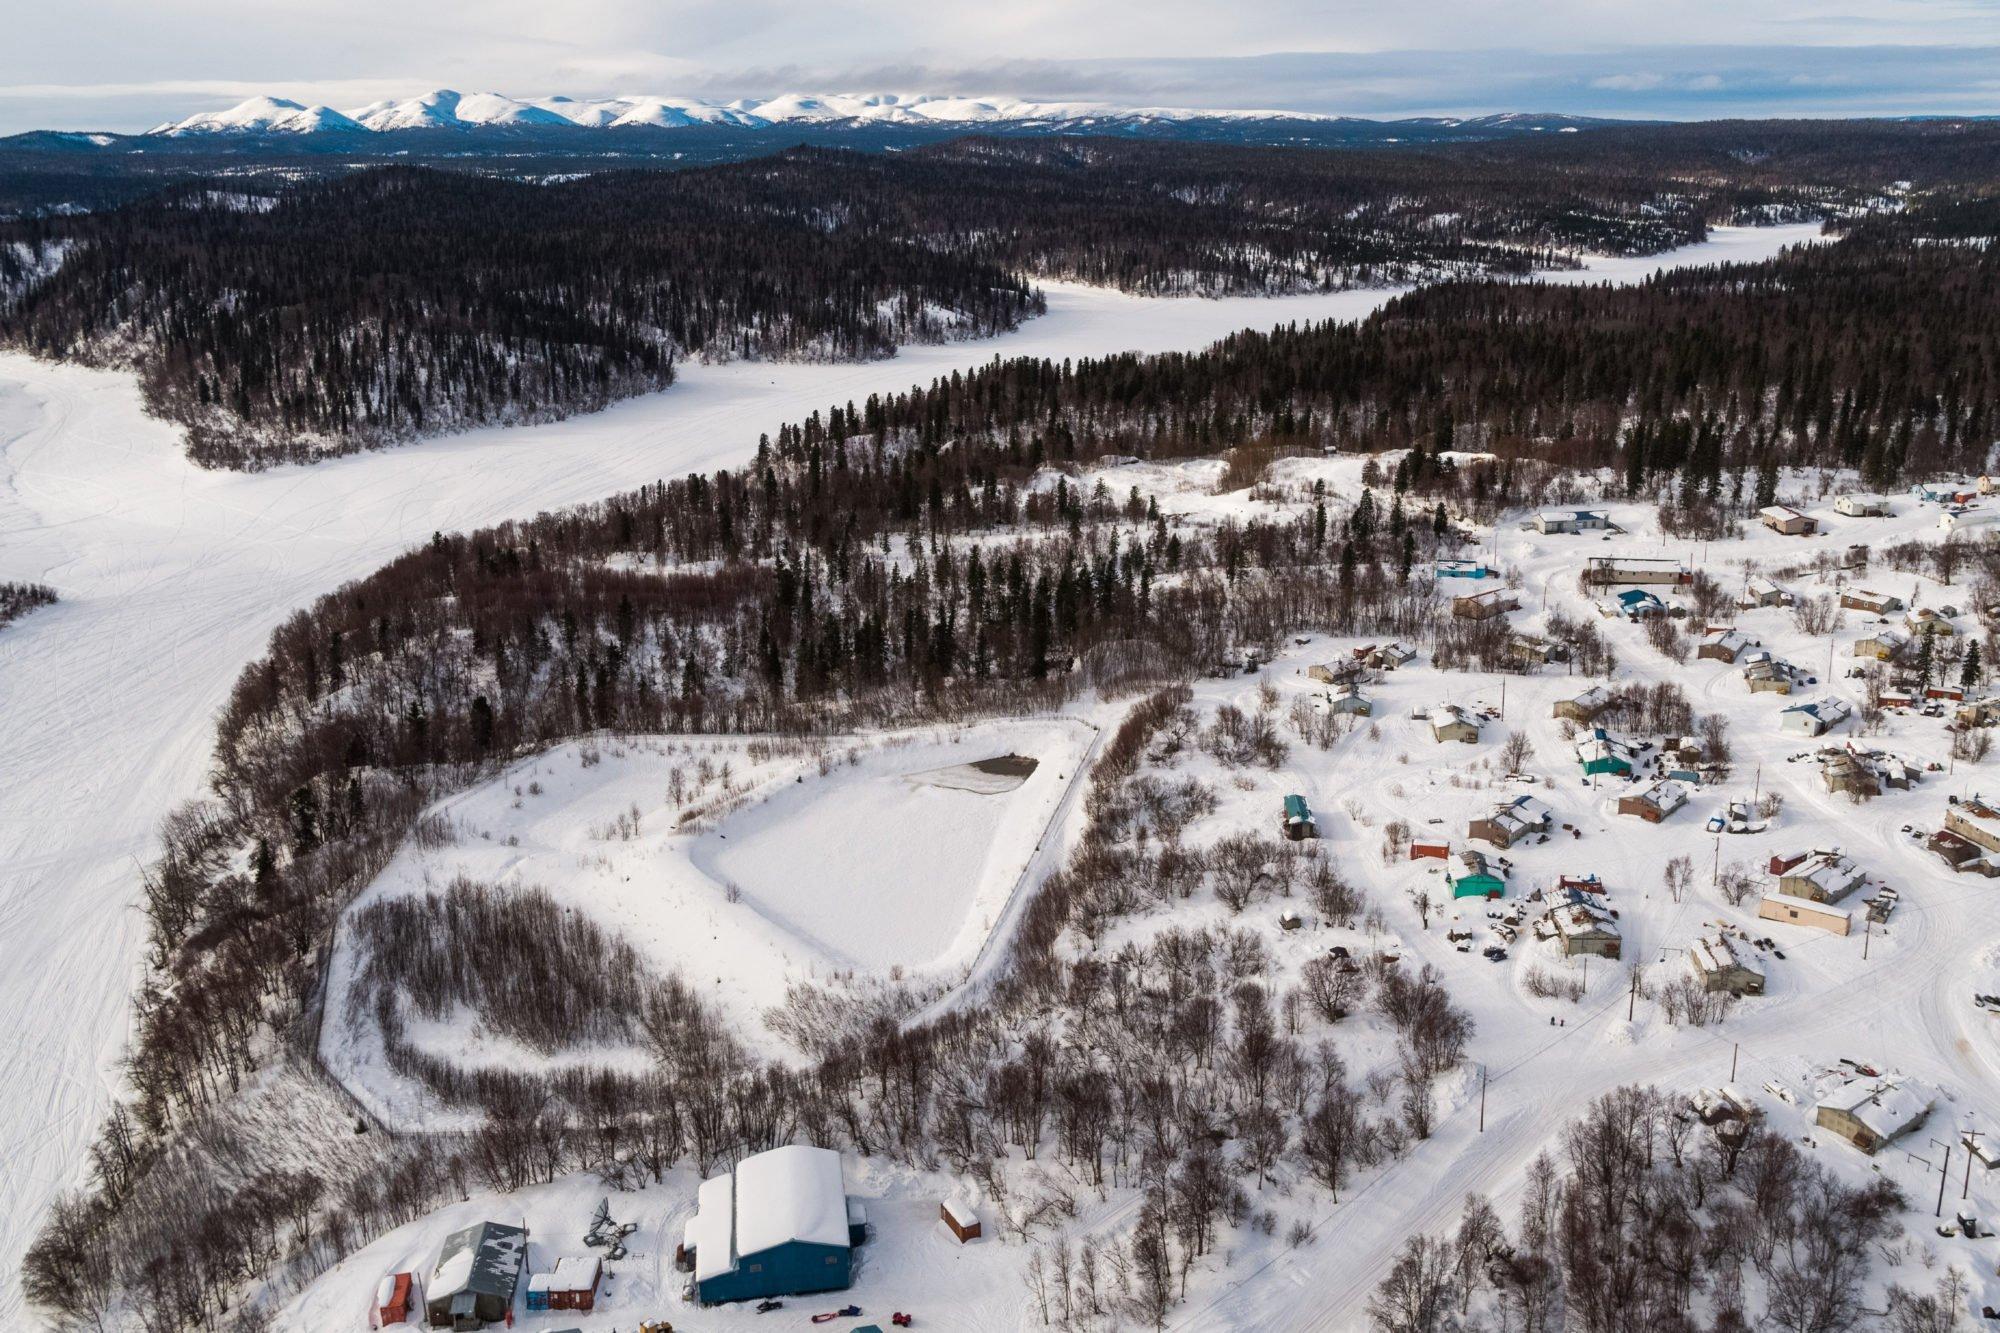 Alaska's Uneven Rural Law Enforcement System Often Leaves Remote Villages With No Cops